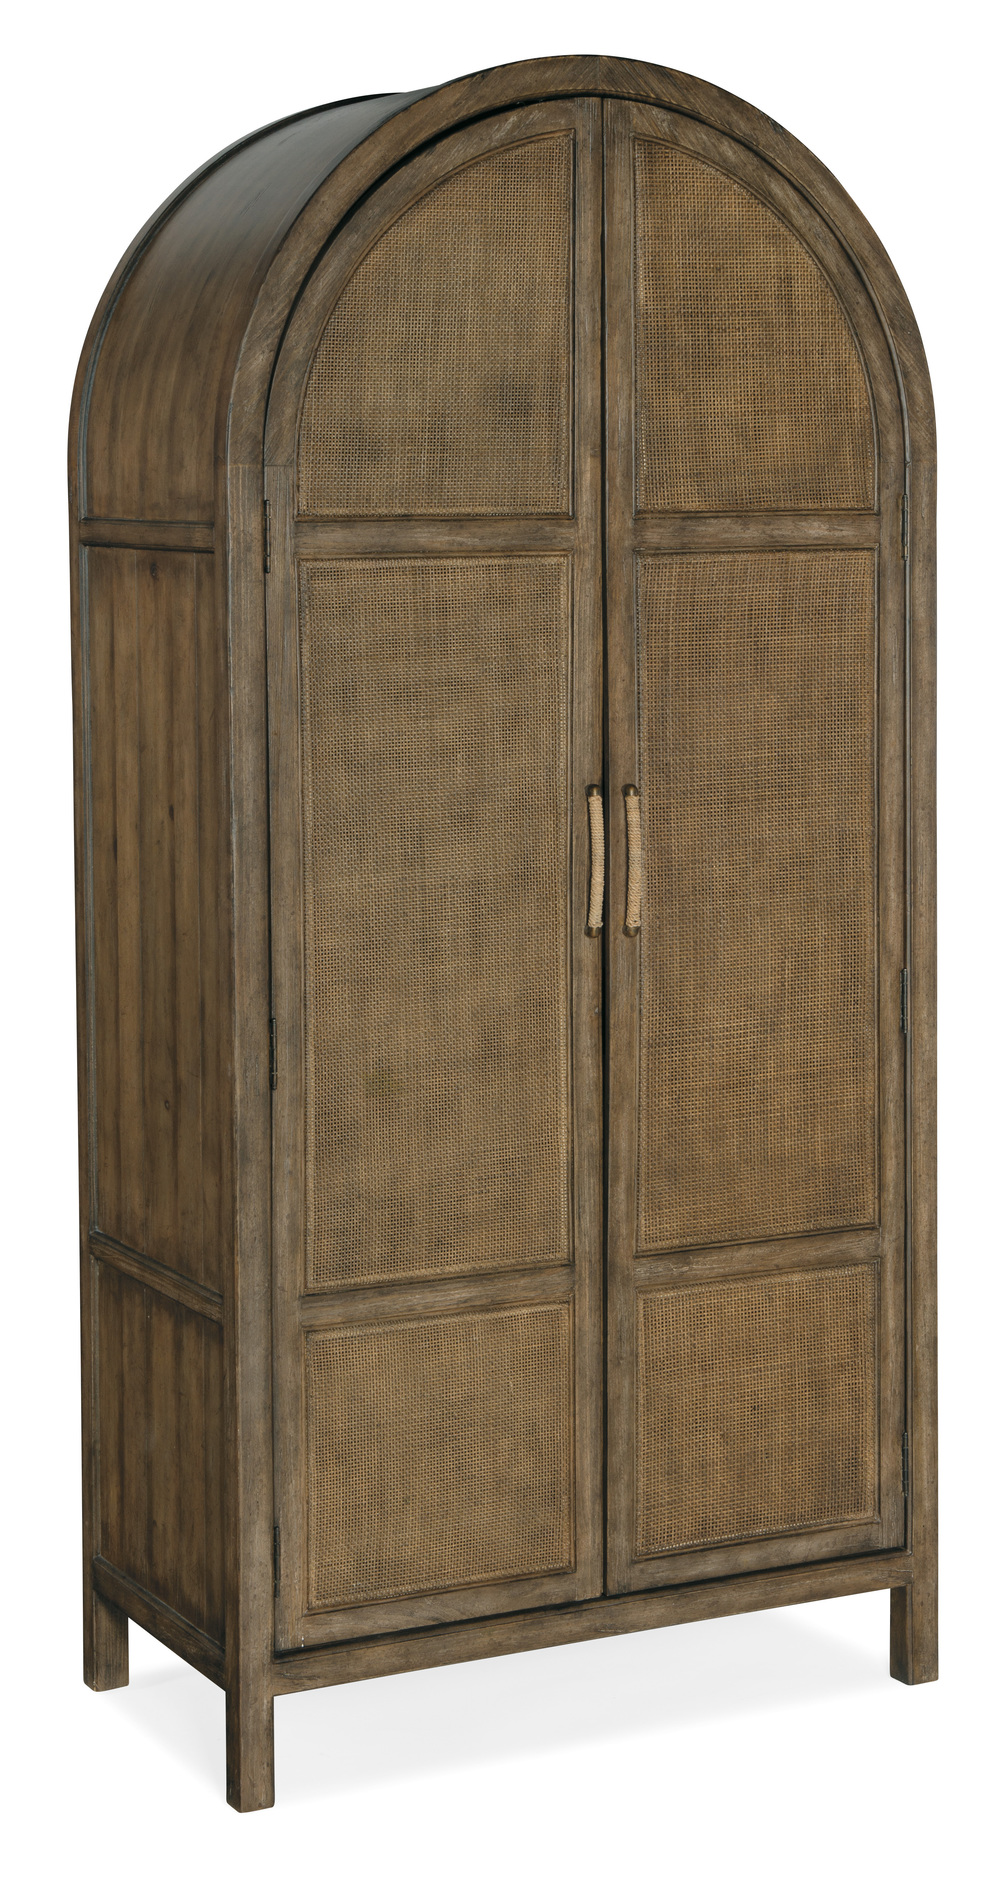 Hooker Furniture - Wardrobe